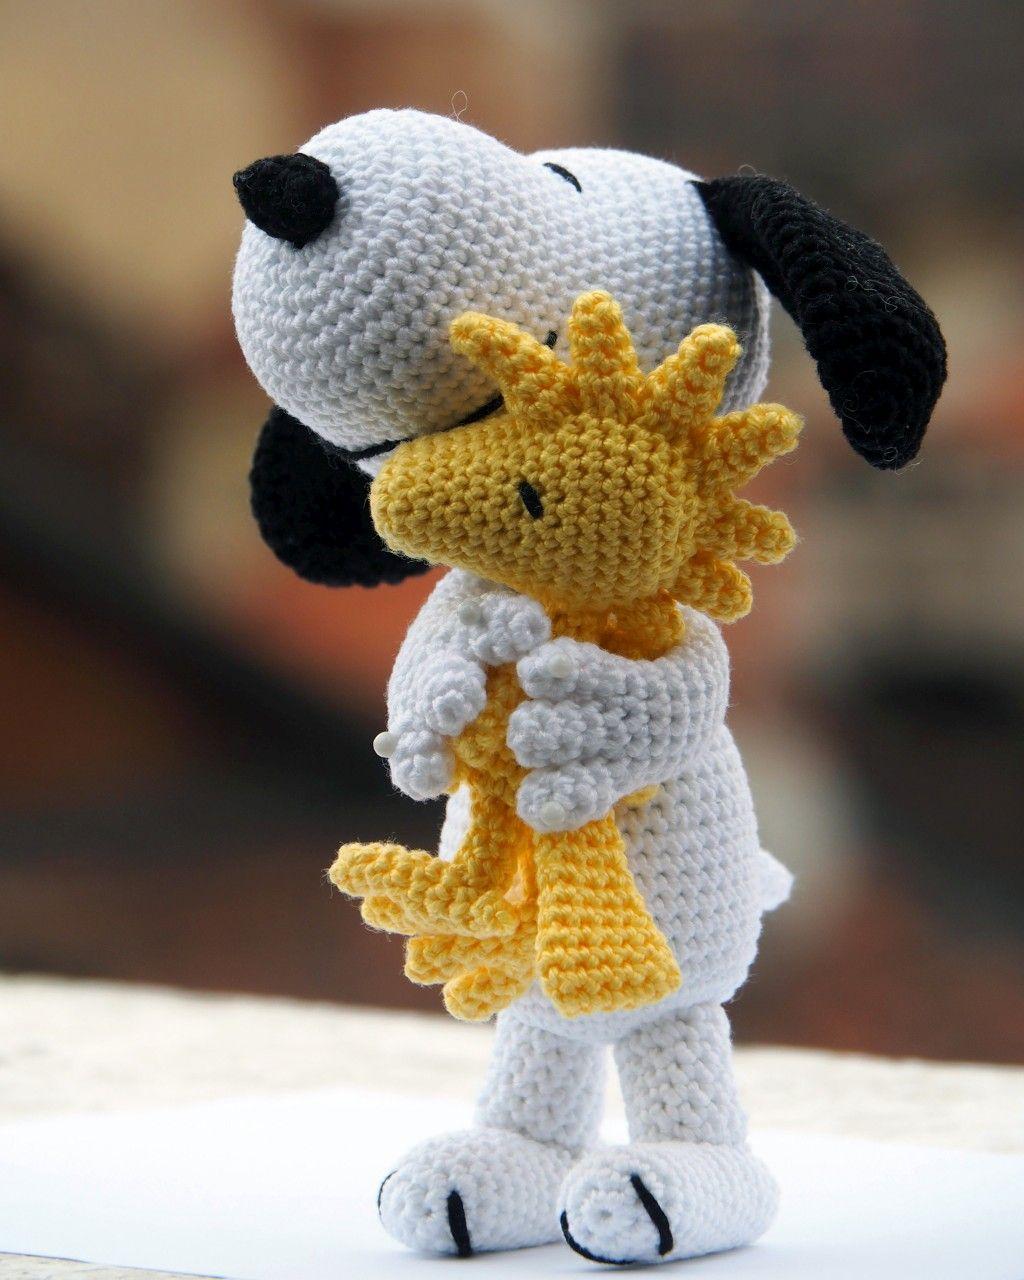 Amigurumi Receitas (amigurumireceita) no Pinterest | 1280x1024